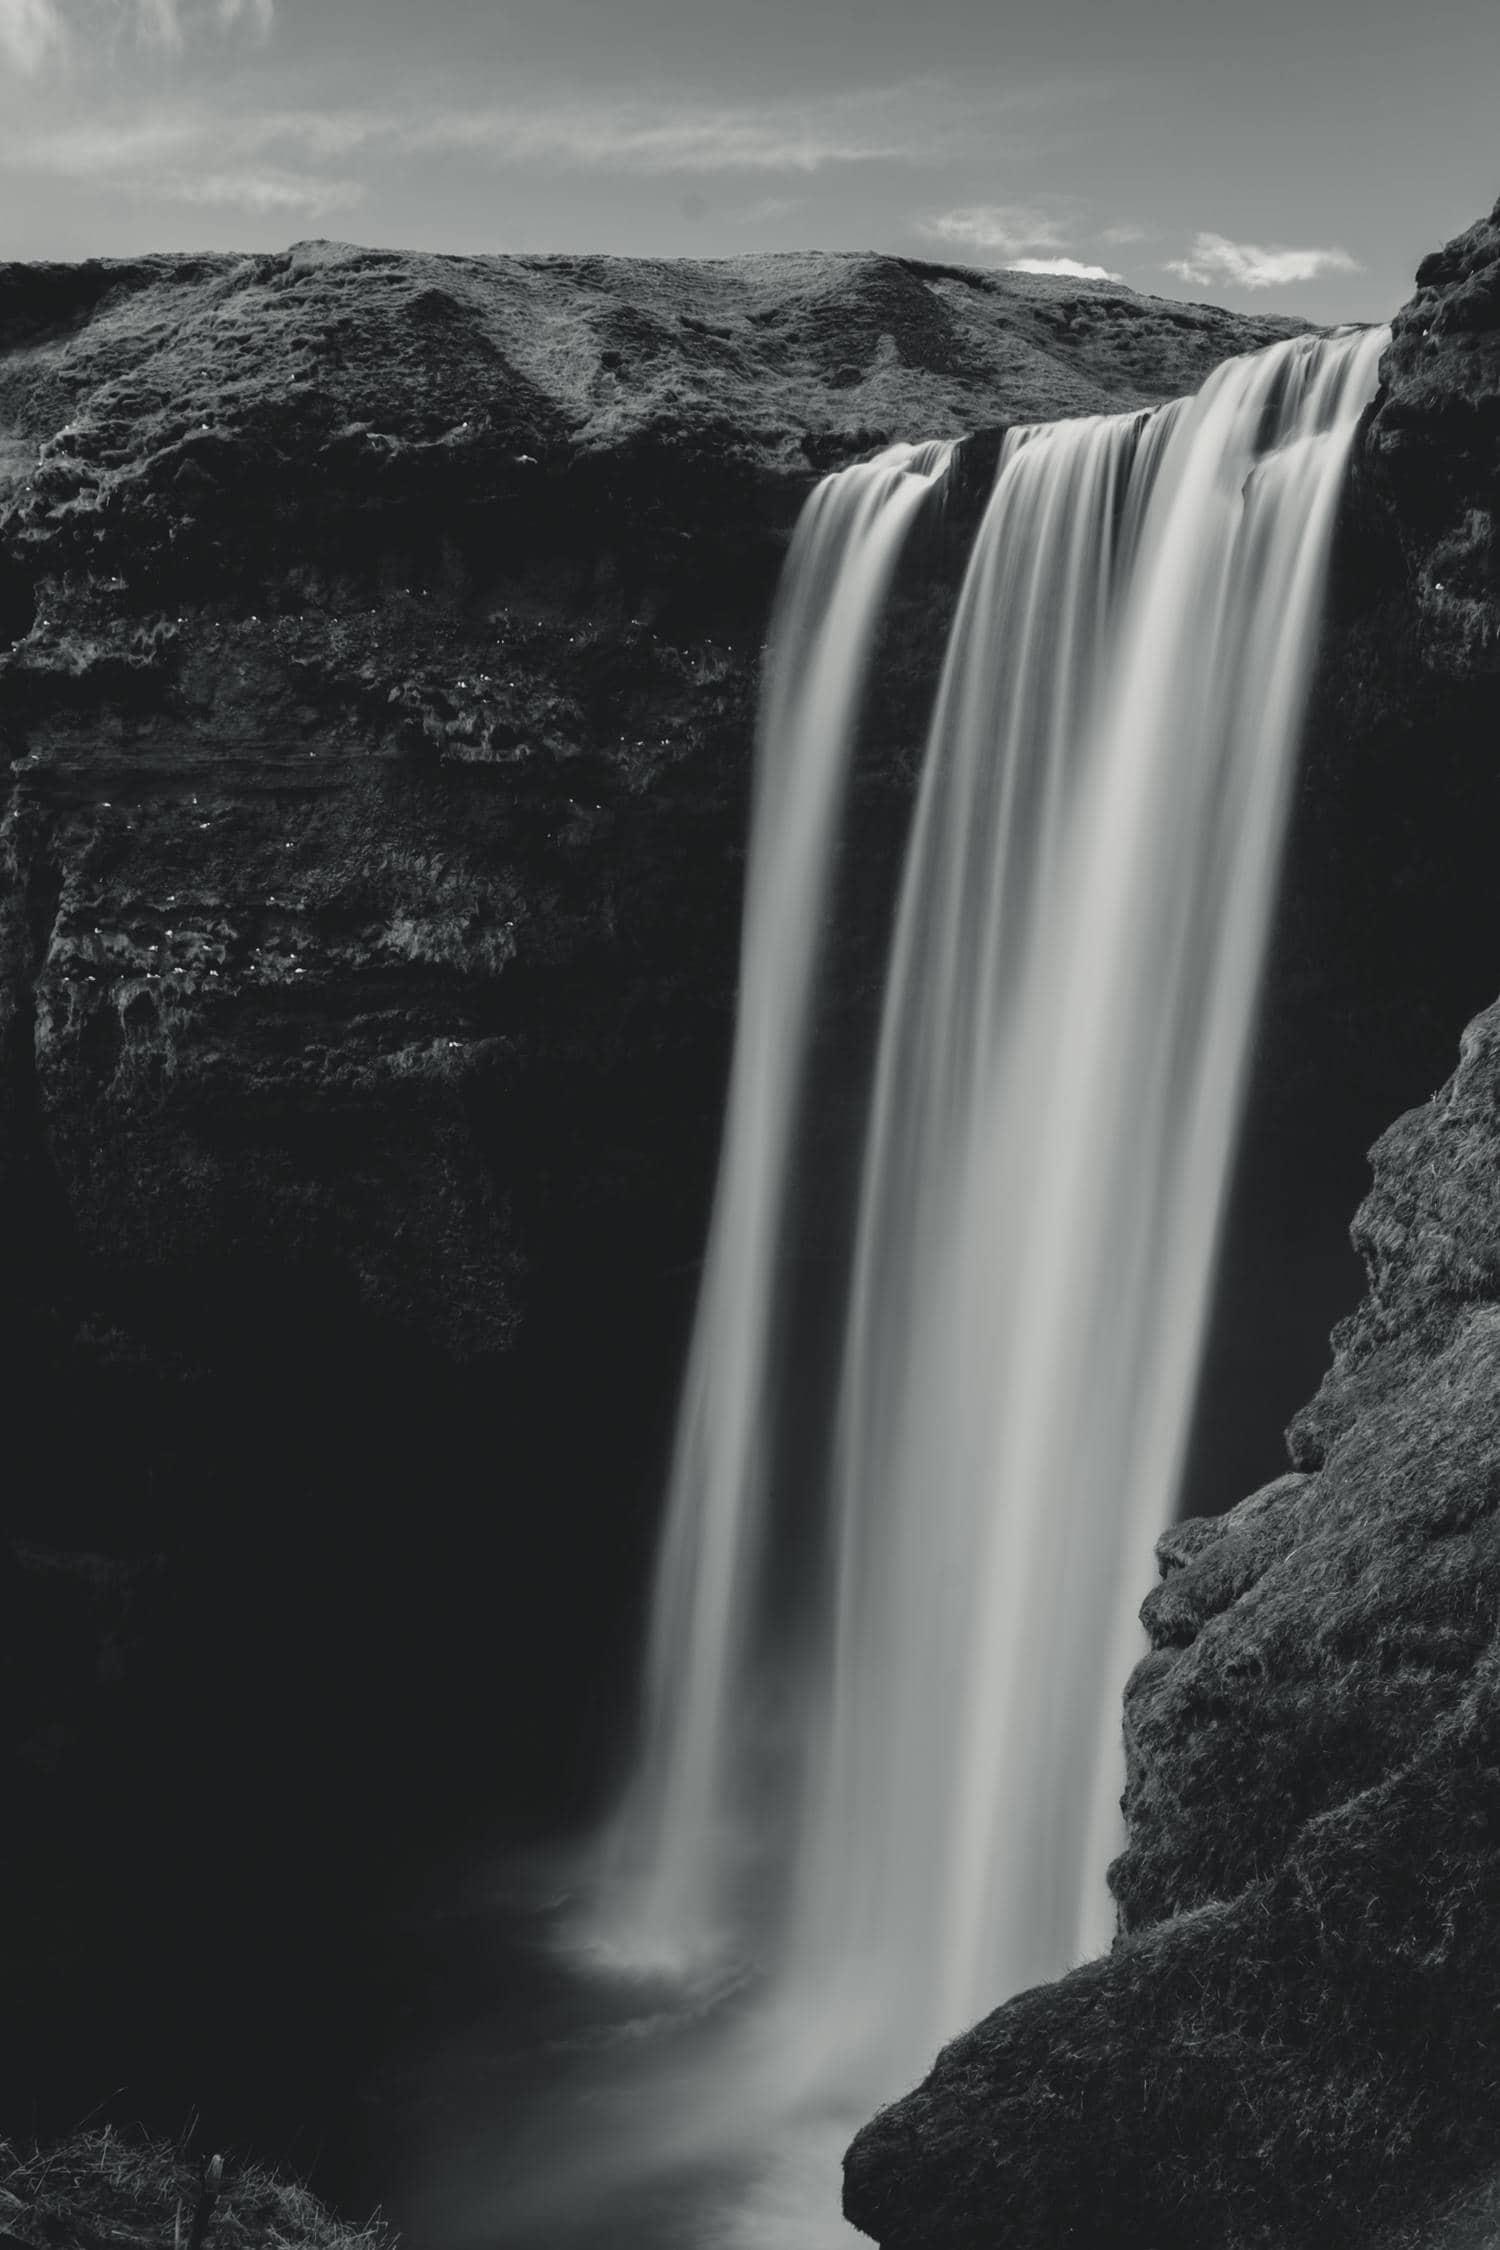 Cascada con agua efecto sedoso por velocidad de obturación lenta